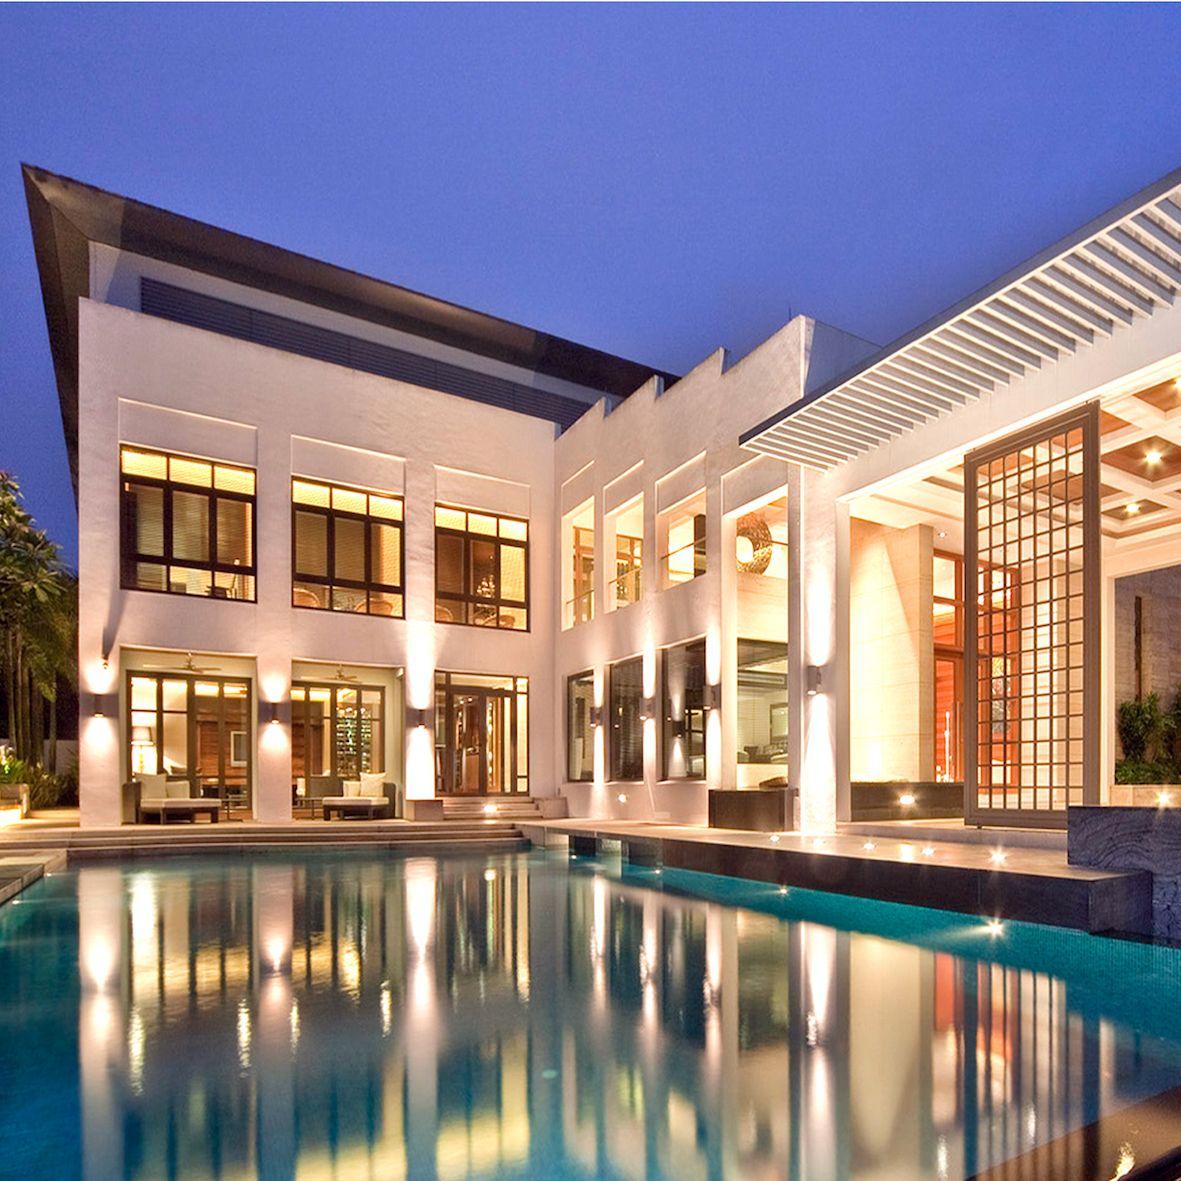 interior design of bungalow houses%0A www iidaintl com Luxurious Residential designs Good Class Bungalows